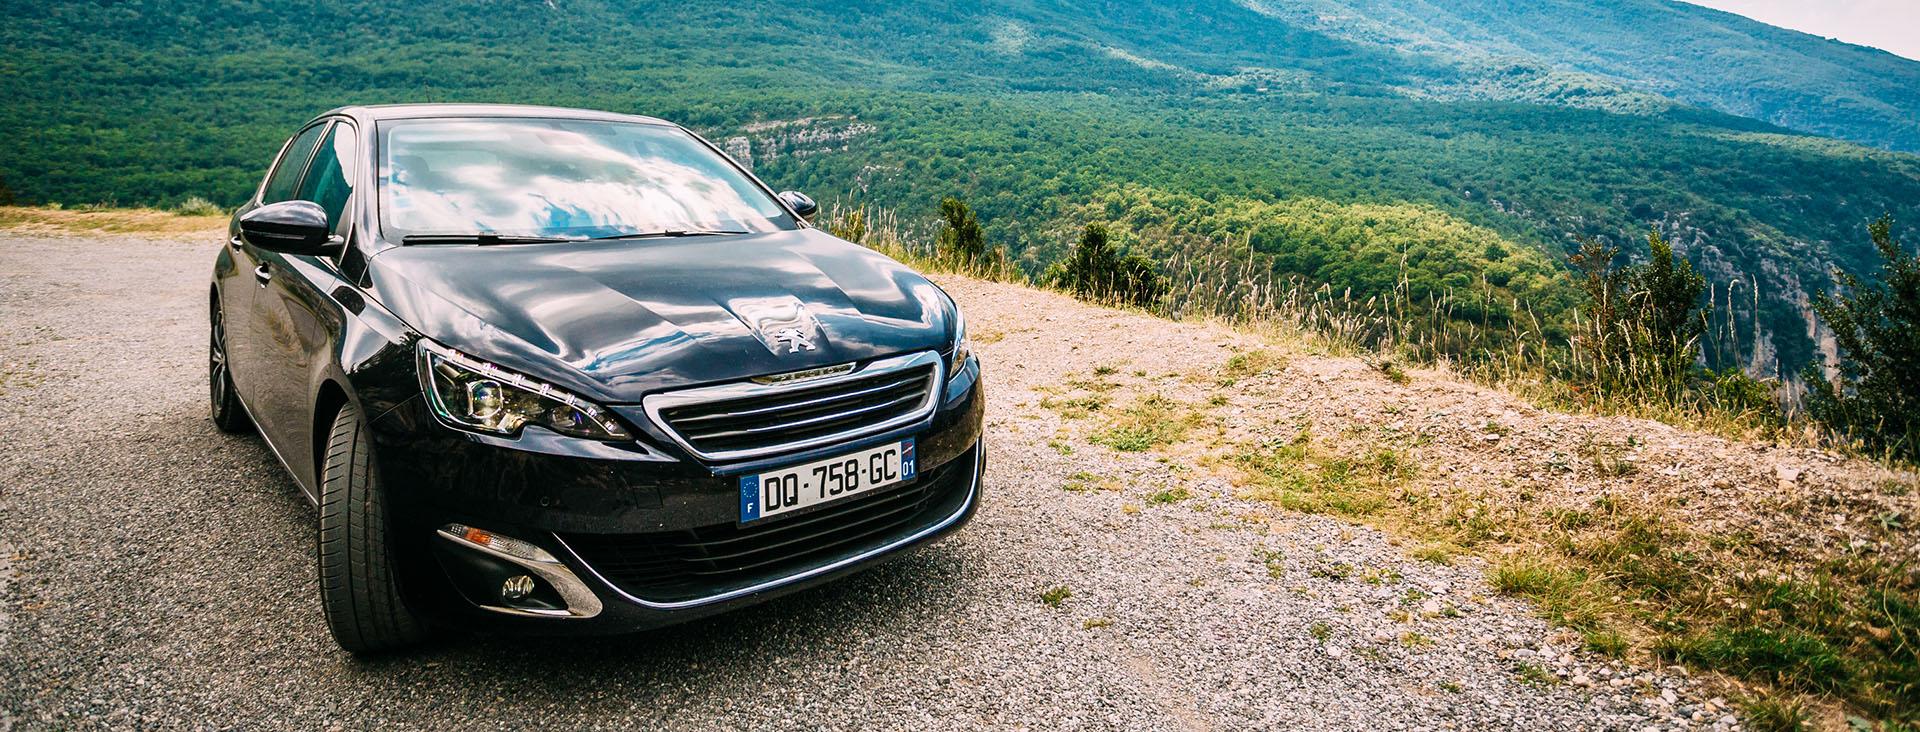 Peugeot Gebrauchtwagen bestellen